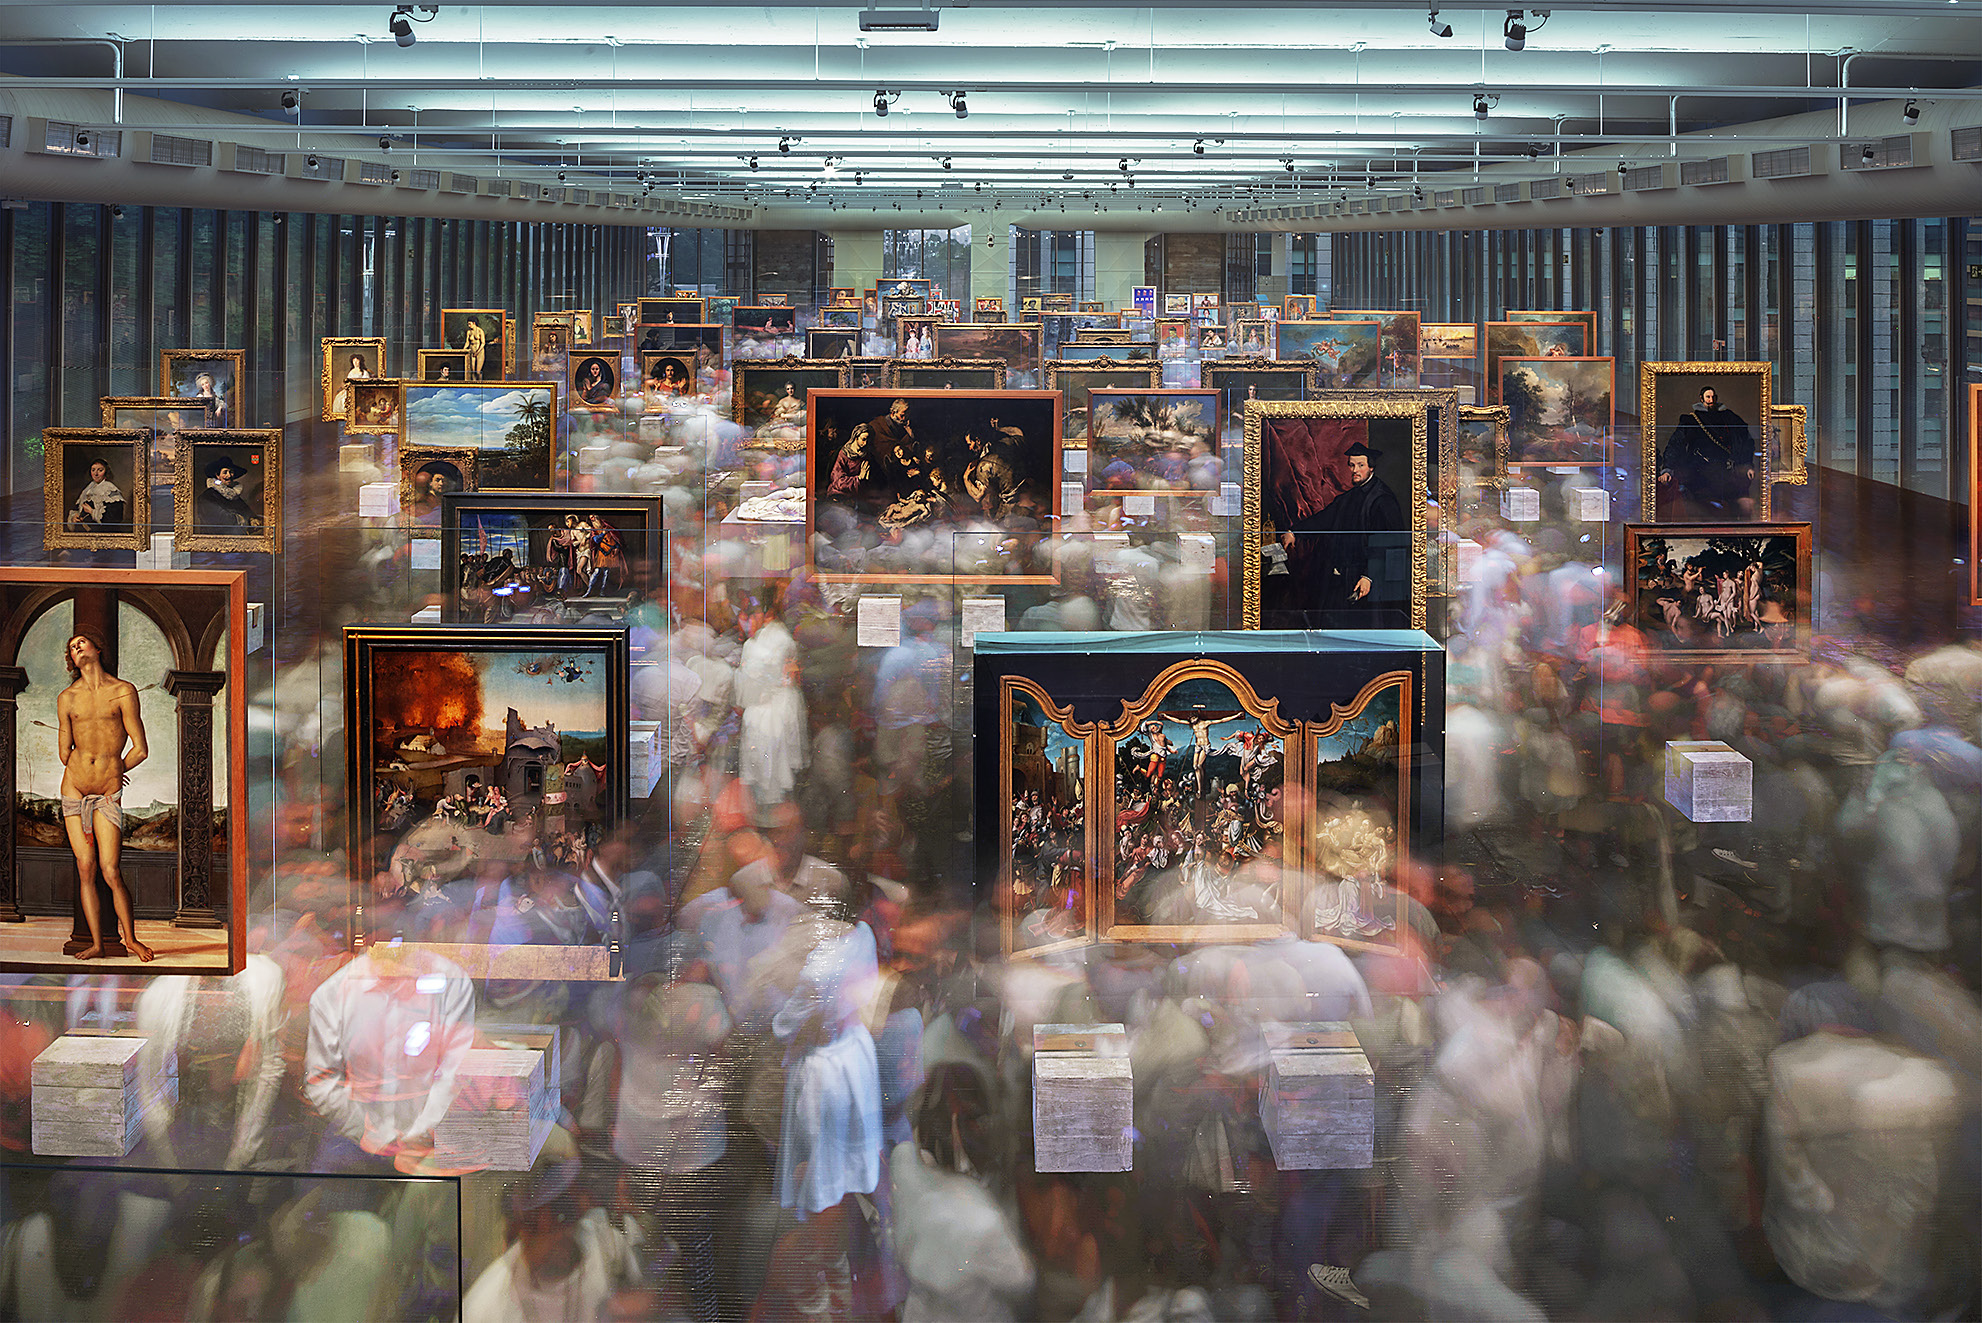 Apertura, Pinacoteca MASP (19.01 – 23.09 Uhr 10.12.2015) (2)